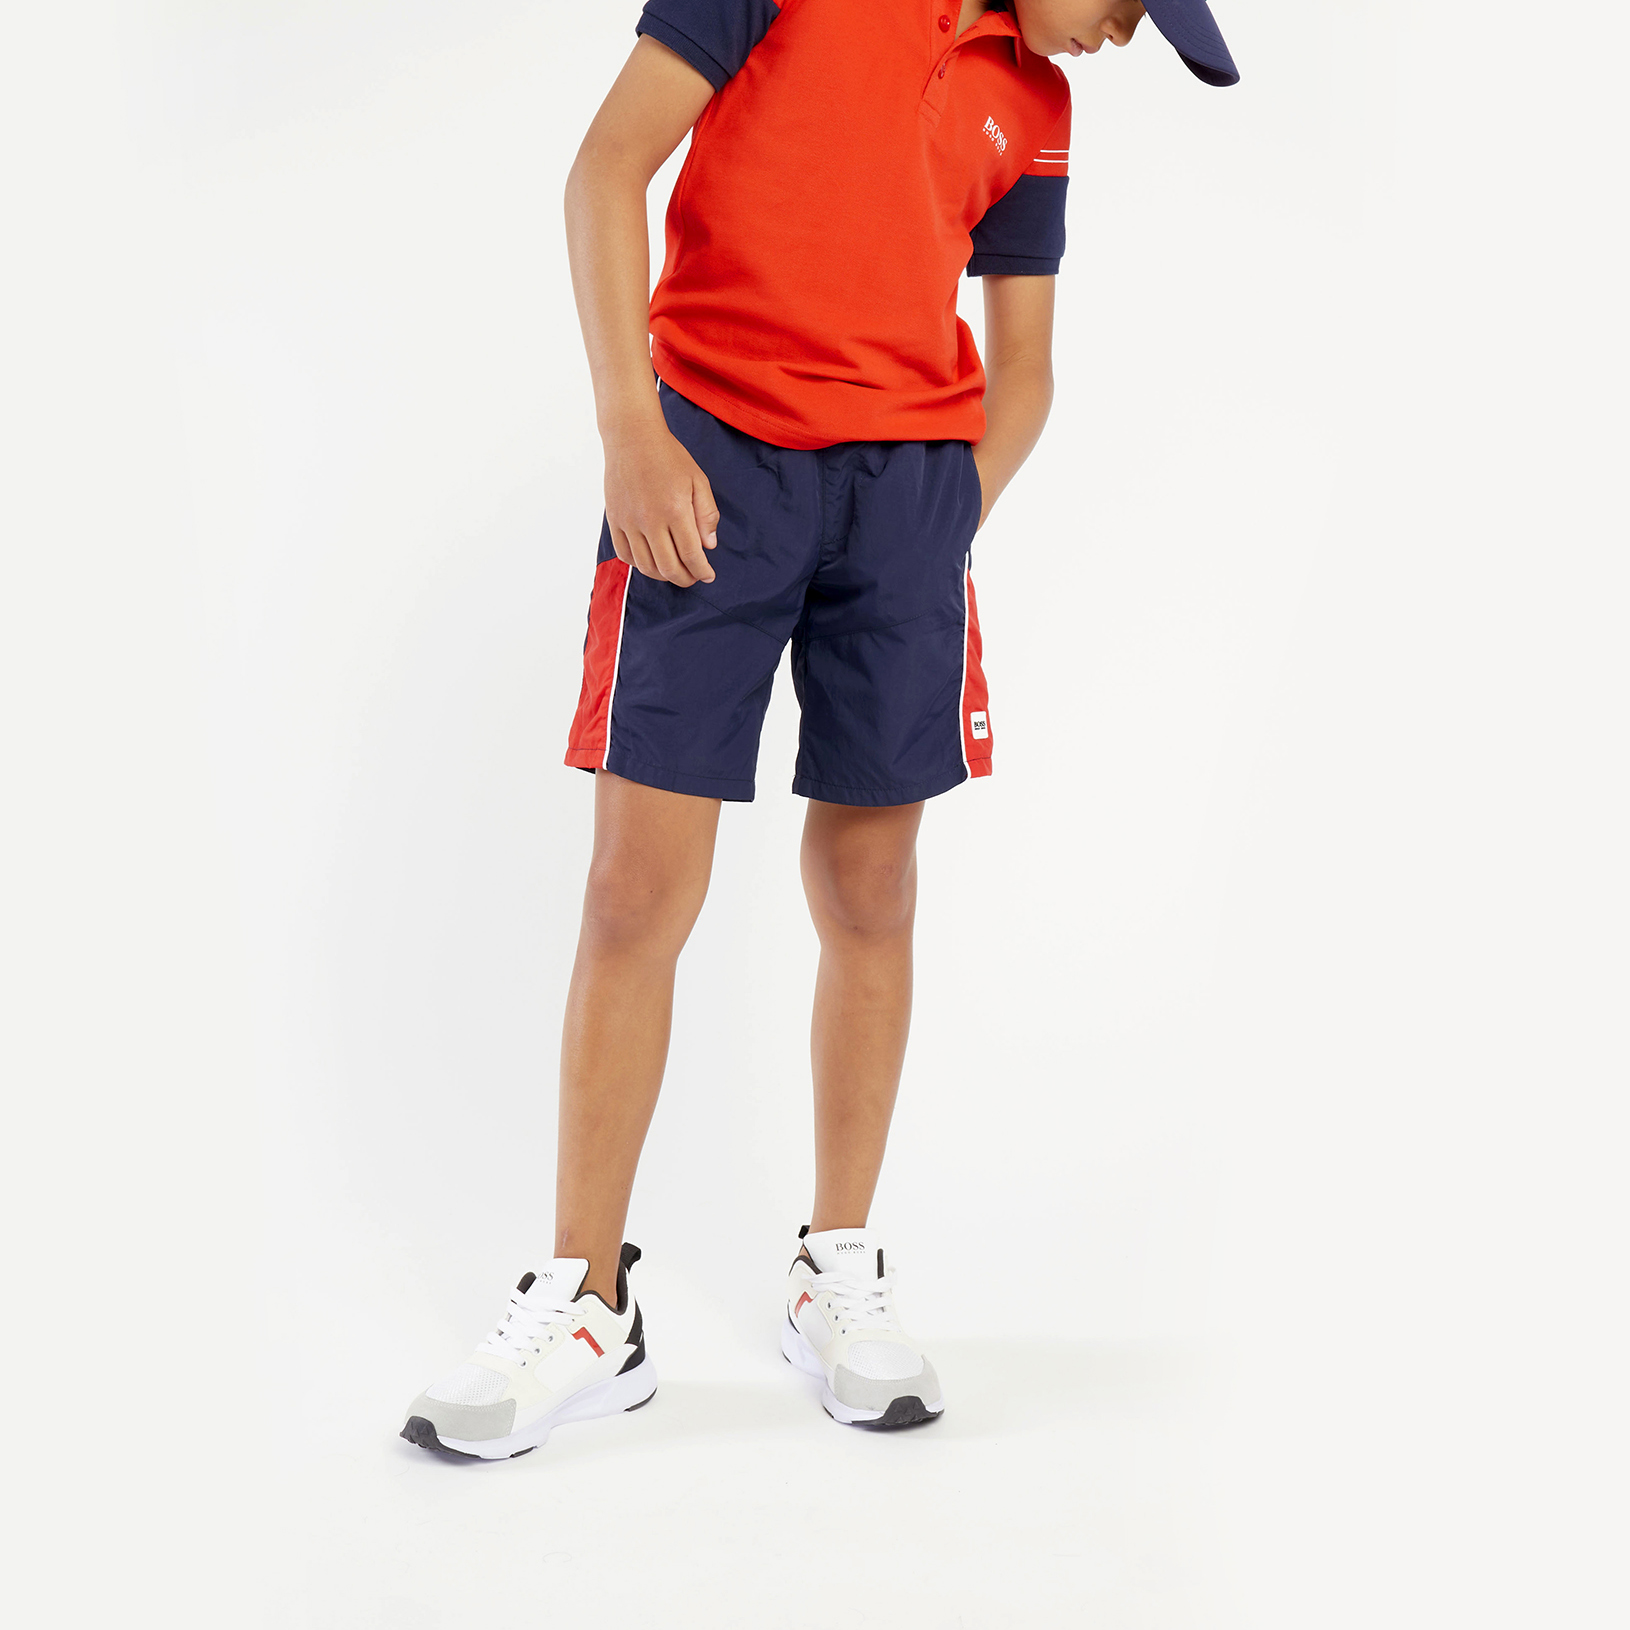 bermuda shorts with oversize logo BOSS for BOY